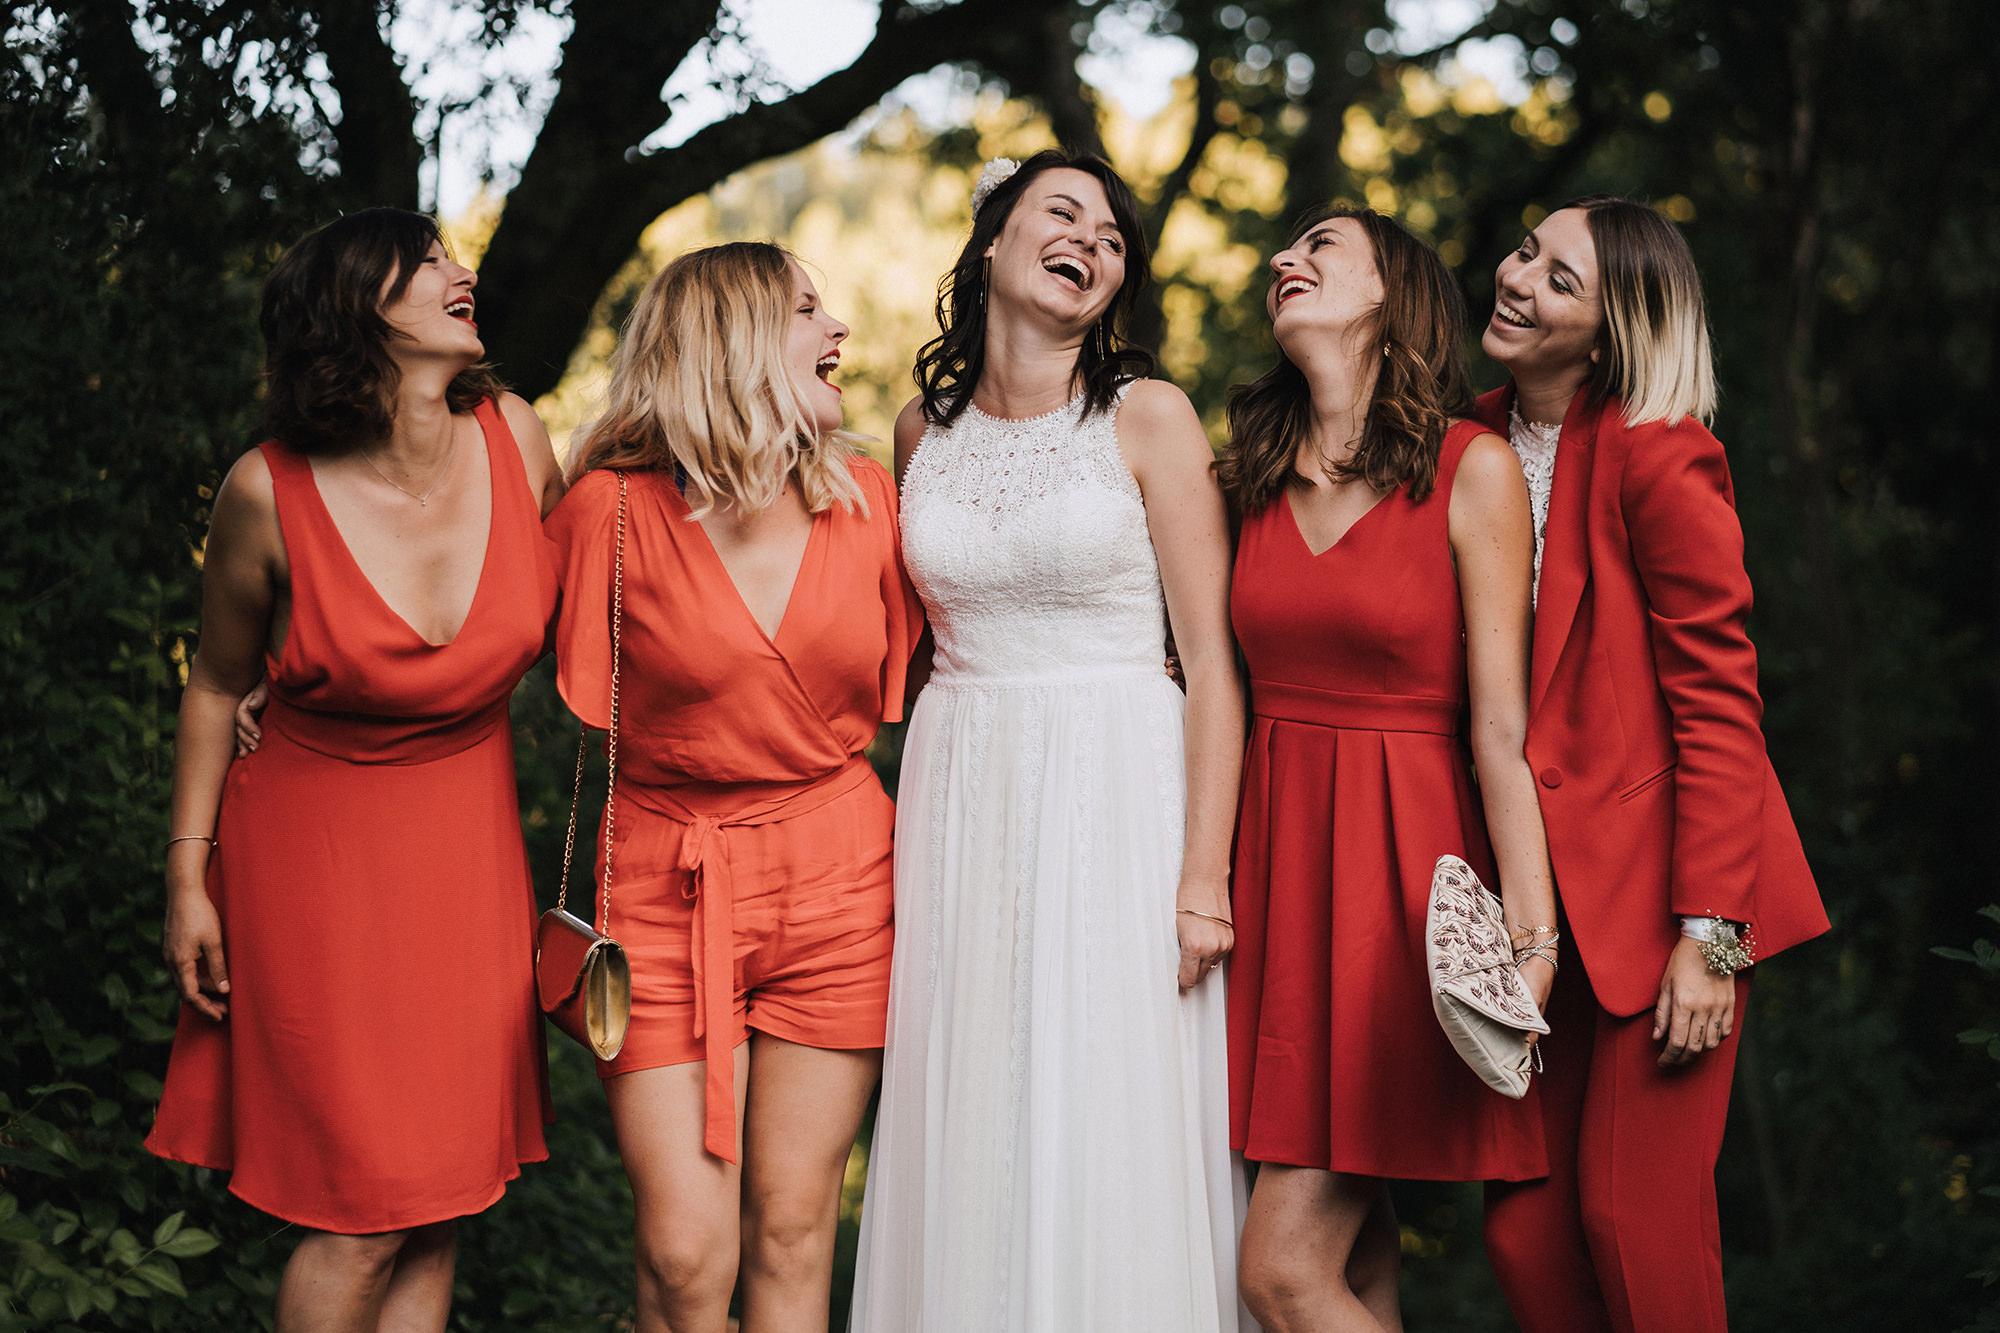 Wedding_provence_neupapphotography_E+Y_chateau_de_mont_vert-620.jpg